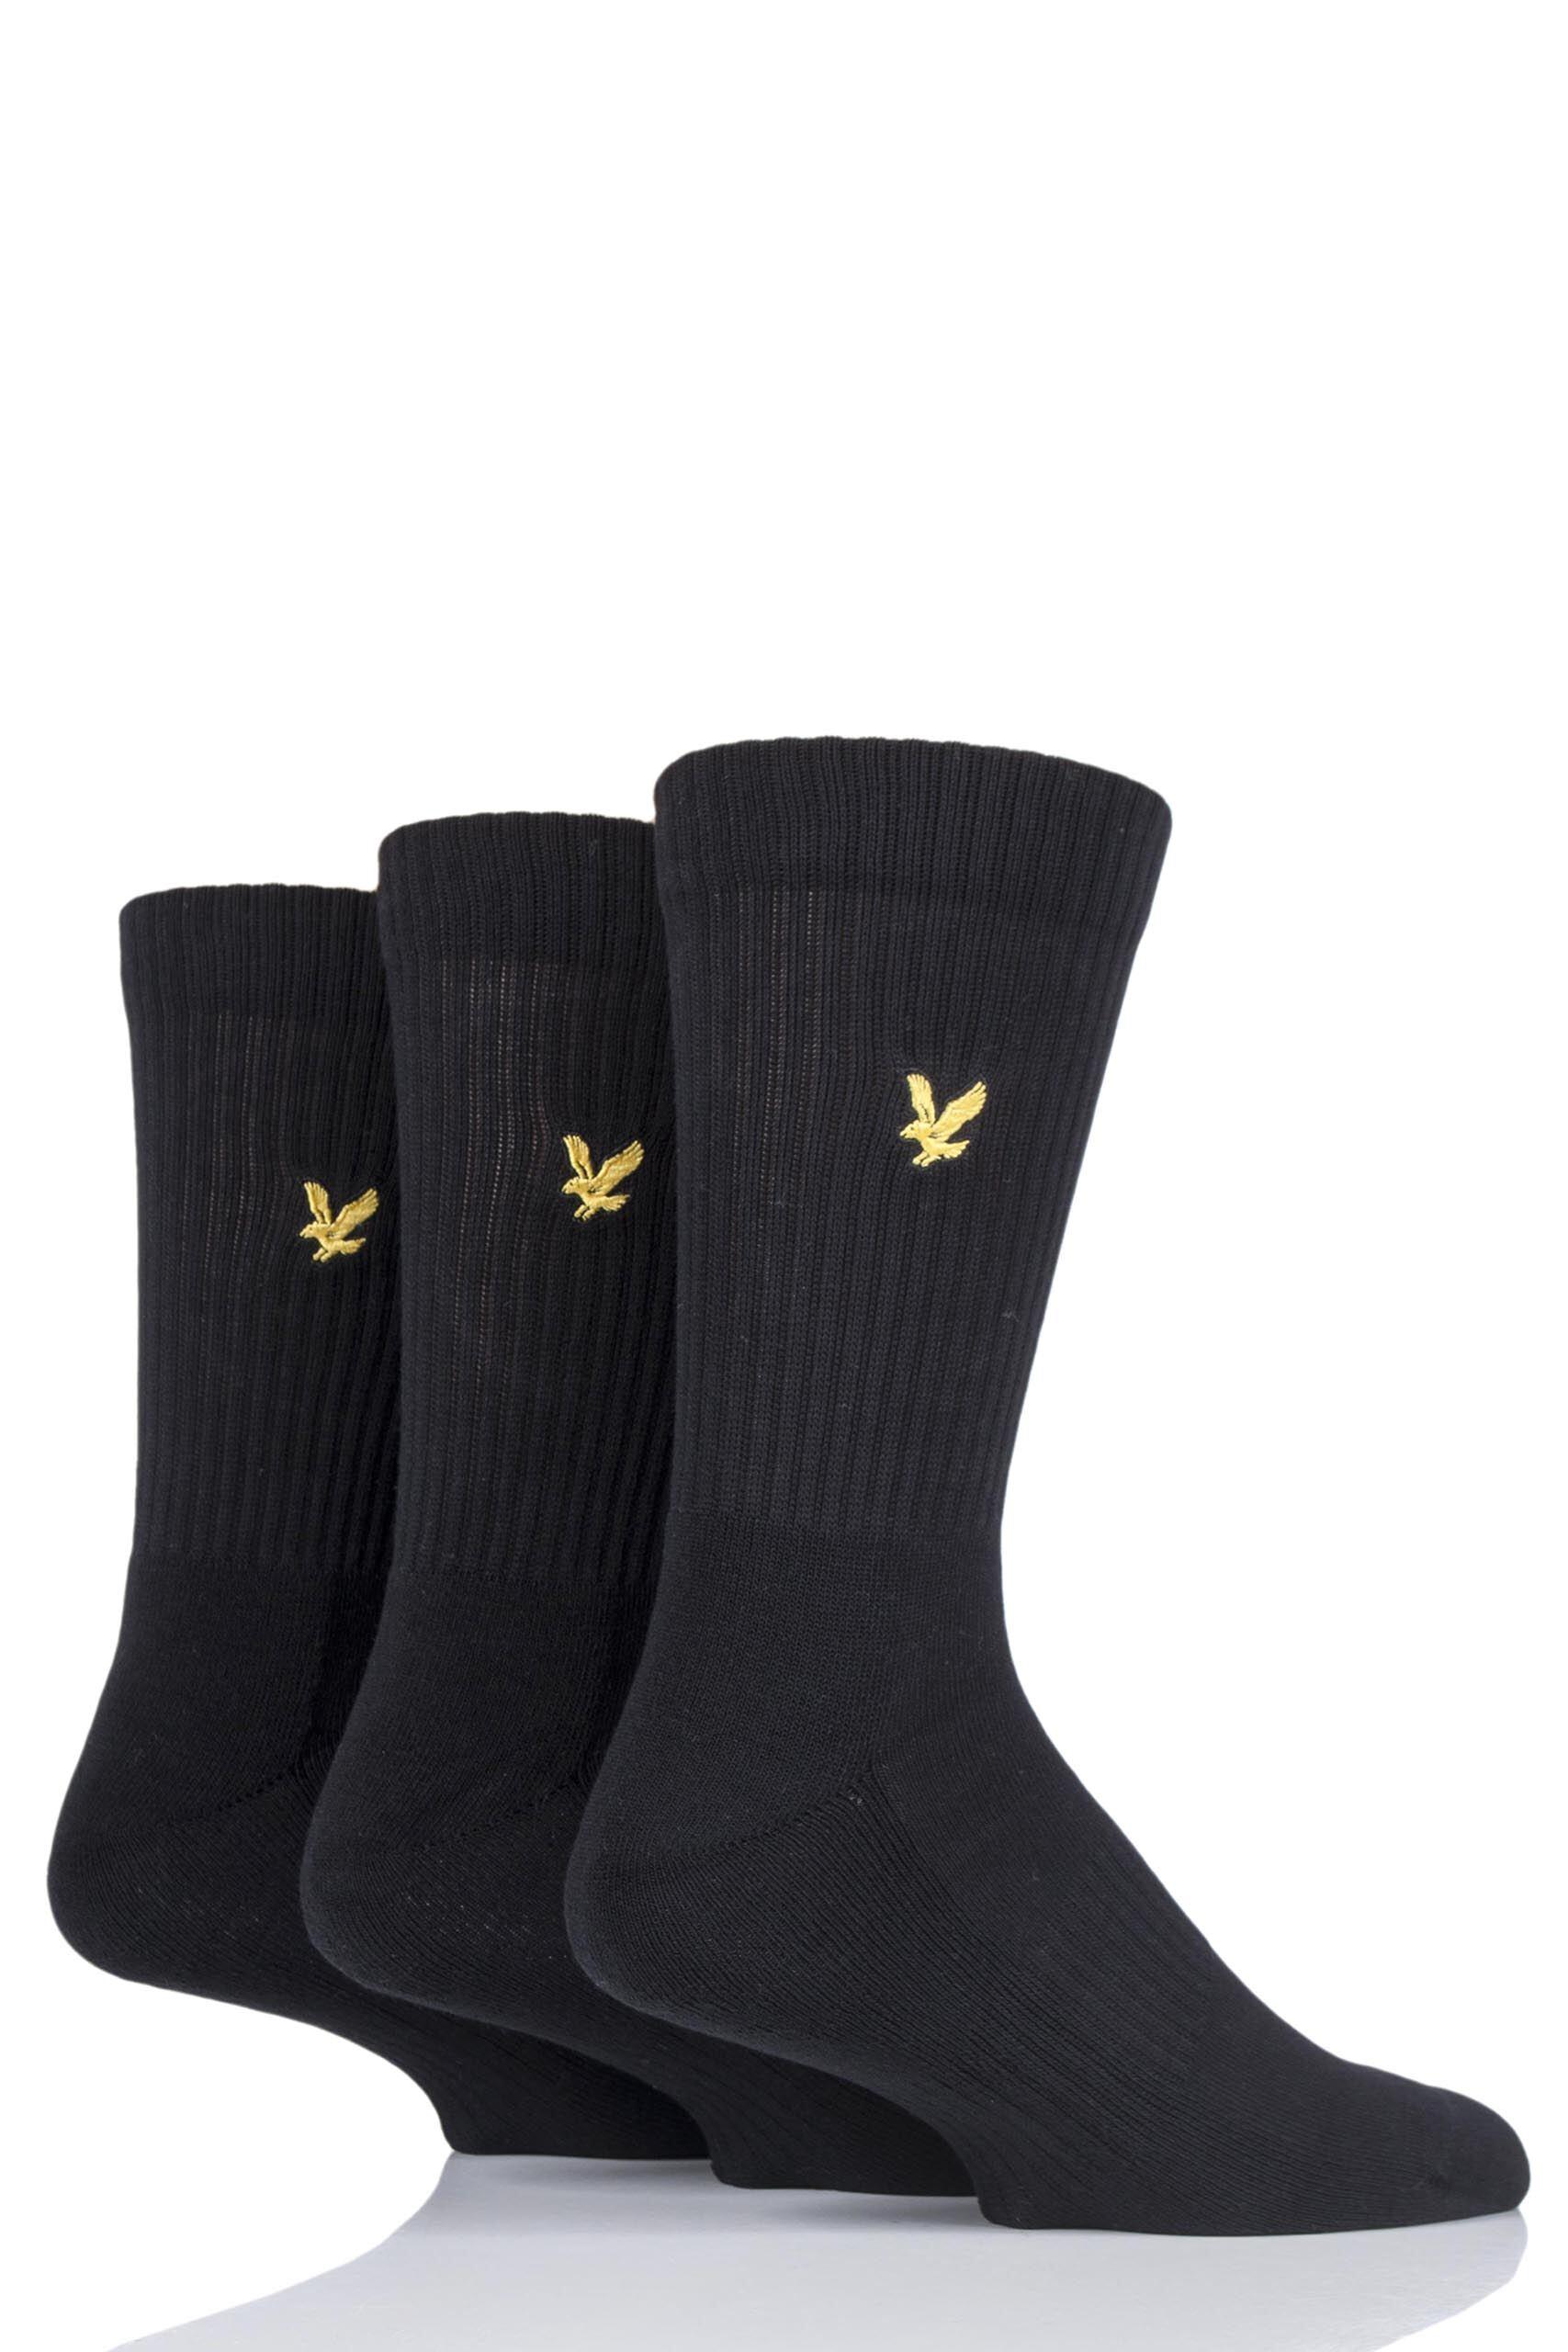 Image of 3 Pair Black Hamilton Plain Cotton Sports Socks Men's 7-11 Mens - Lyle & Scott